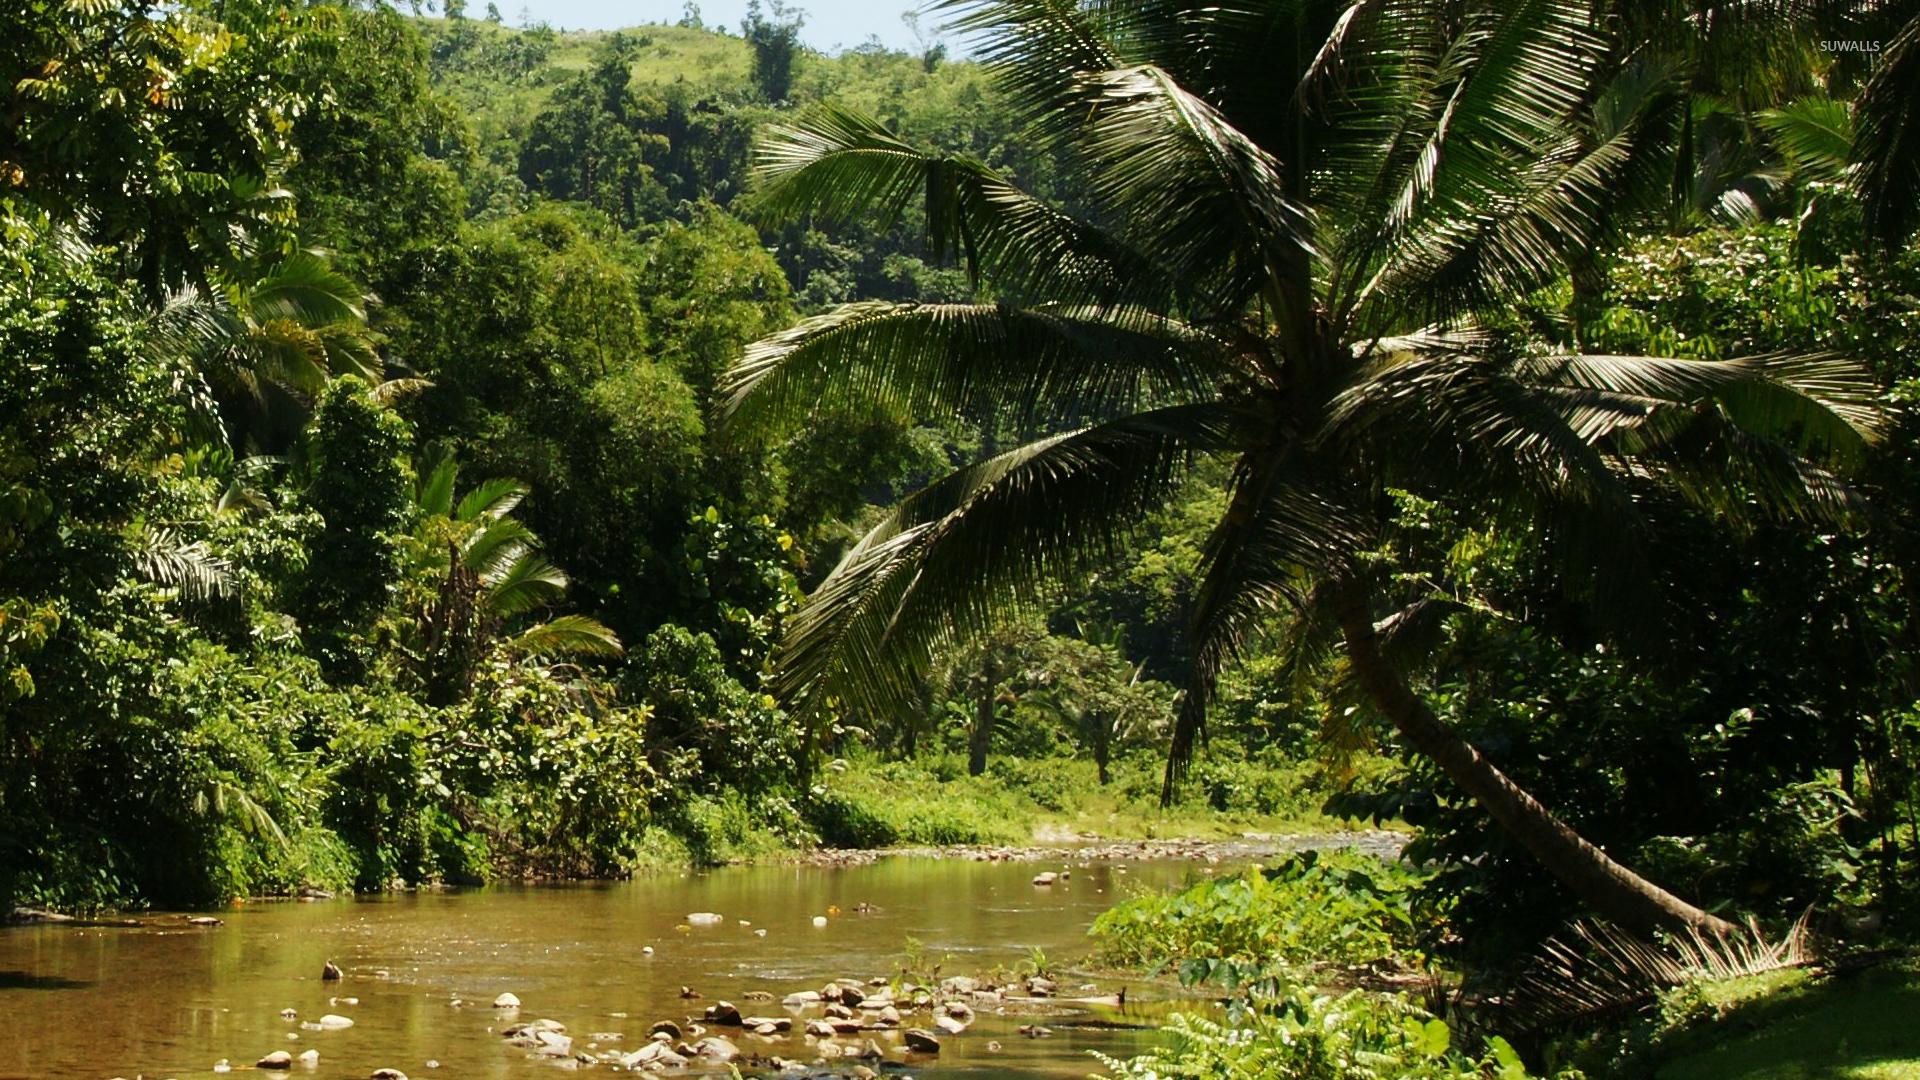 download jungle 1920x1080 1920x1080 - photo #2